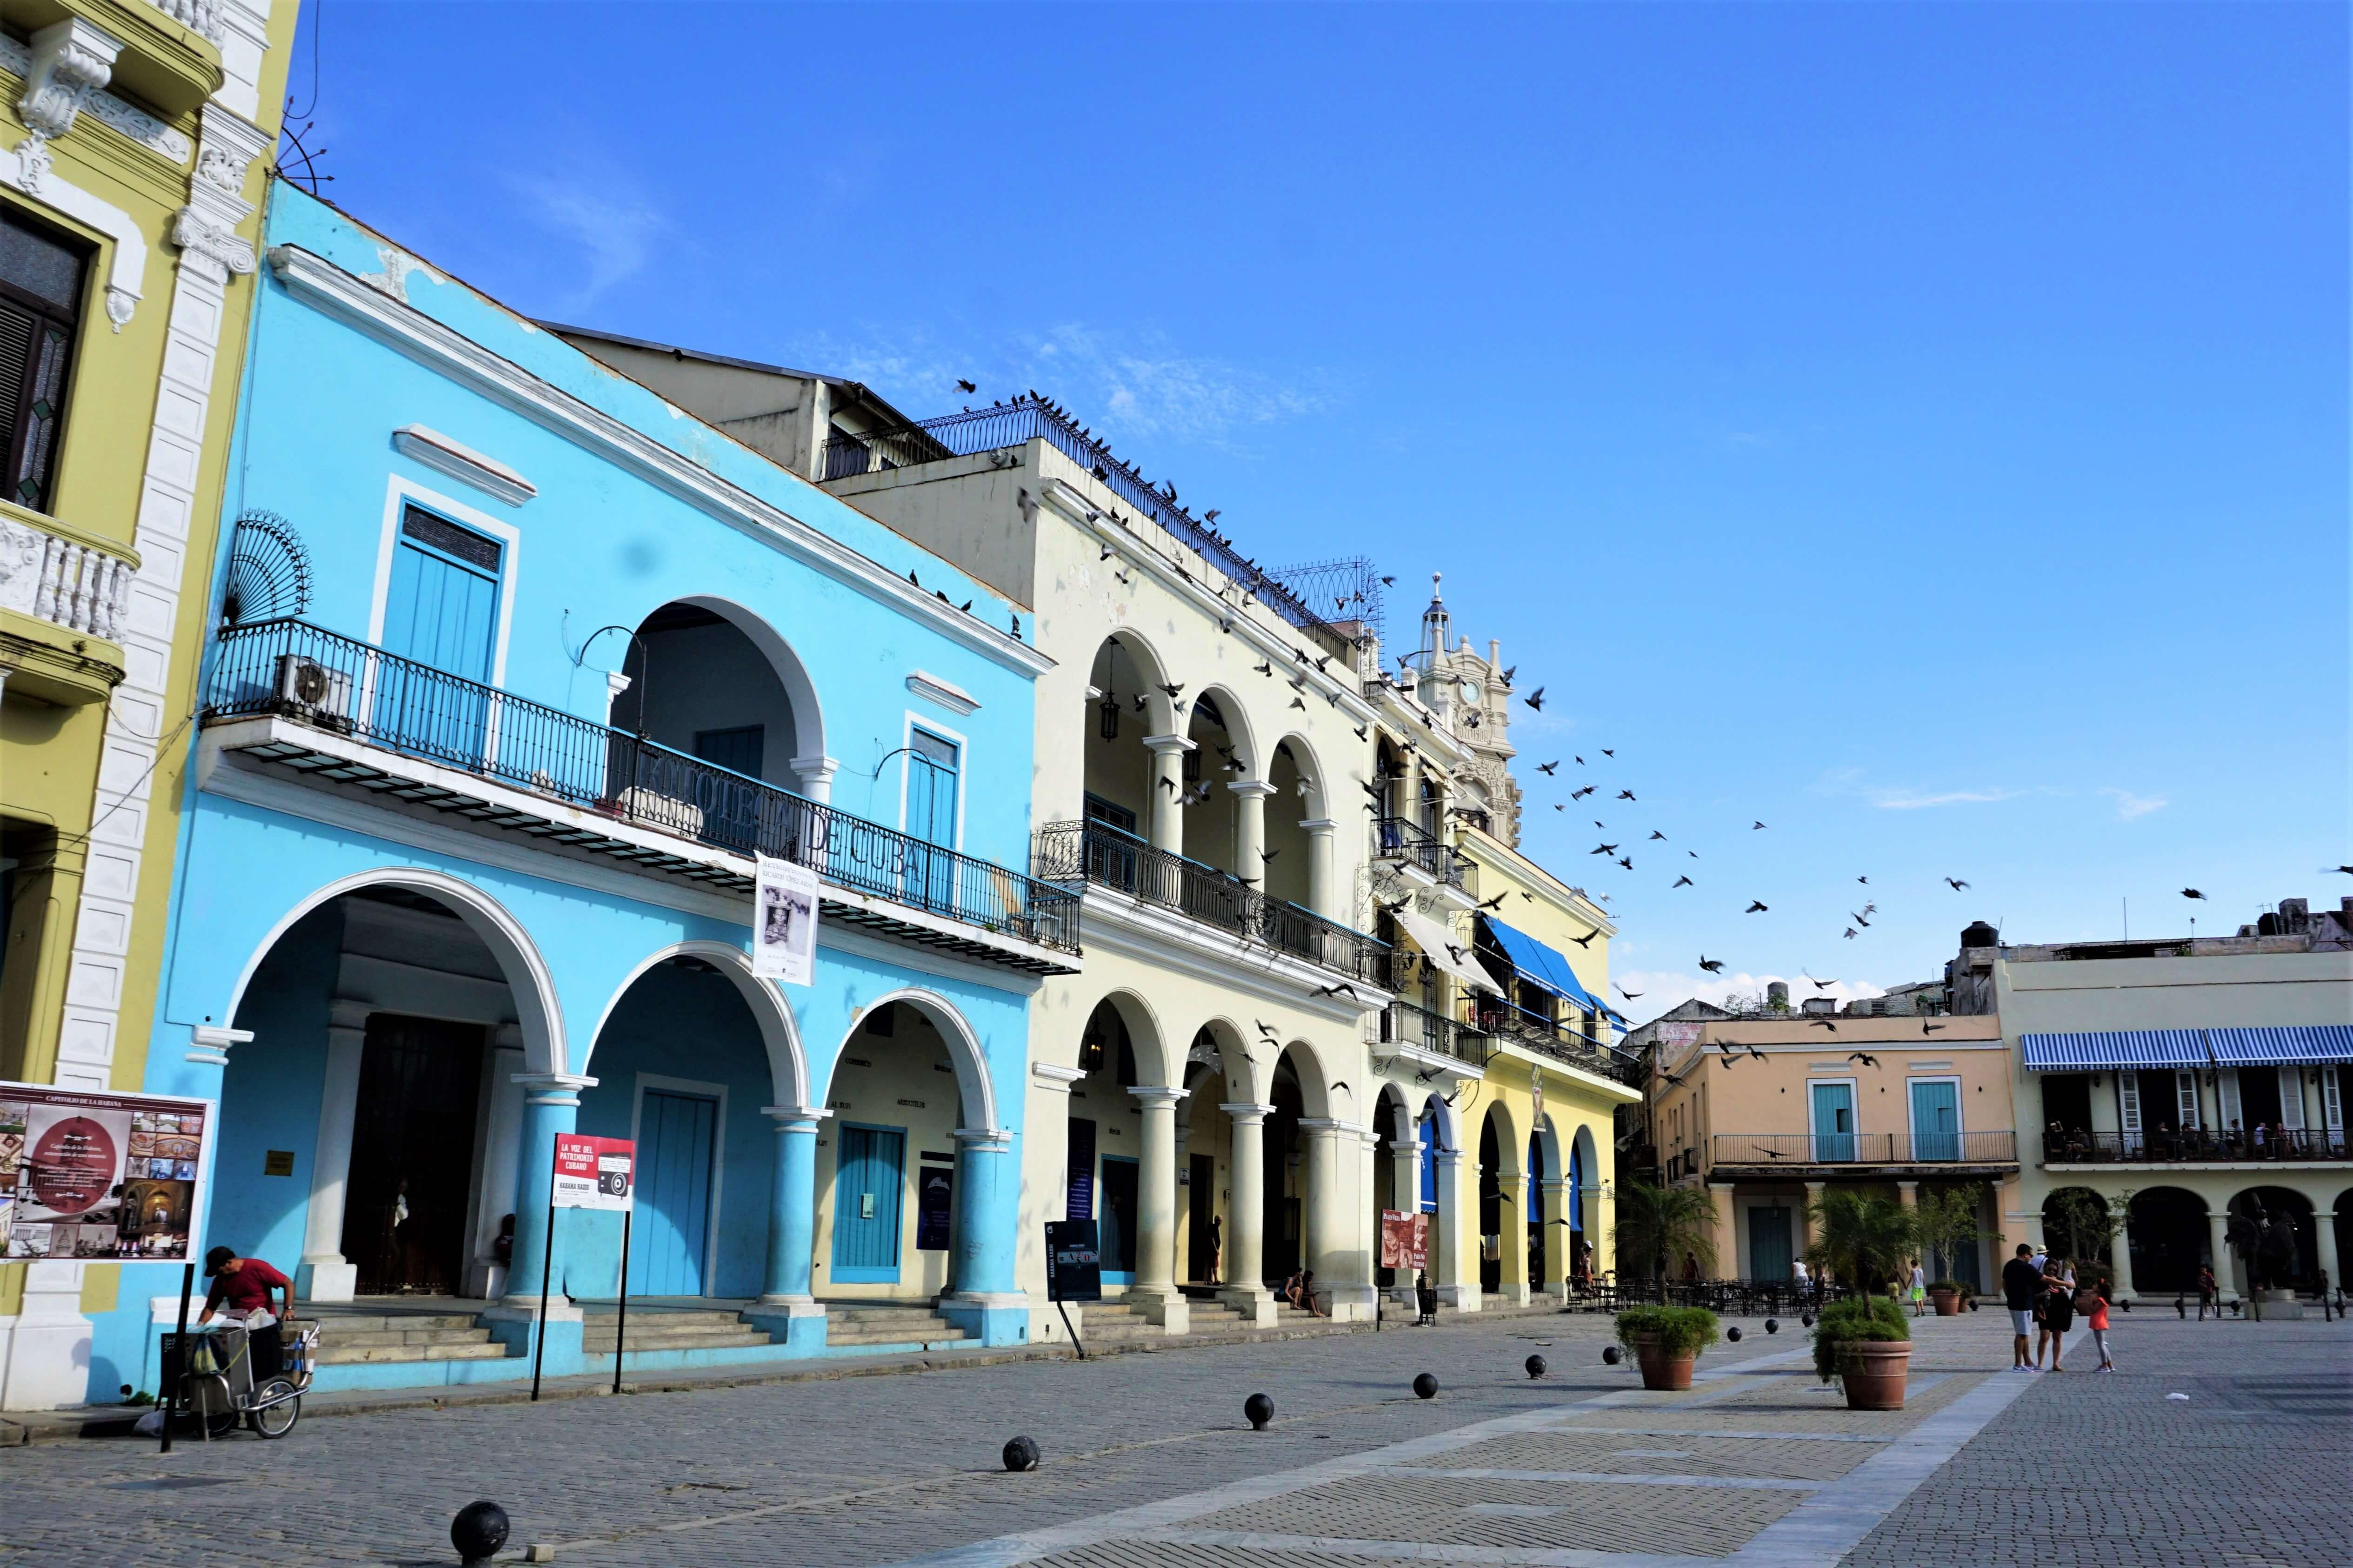 Plaza Viejas in Old Havana Cuba